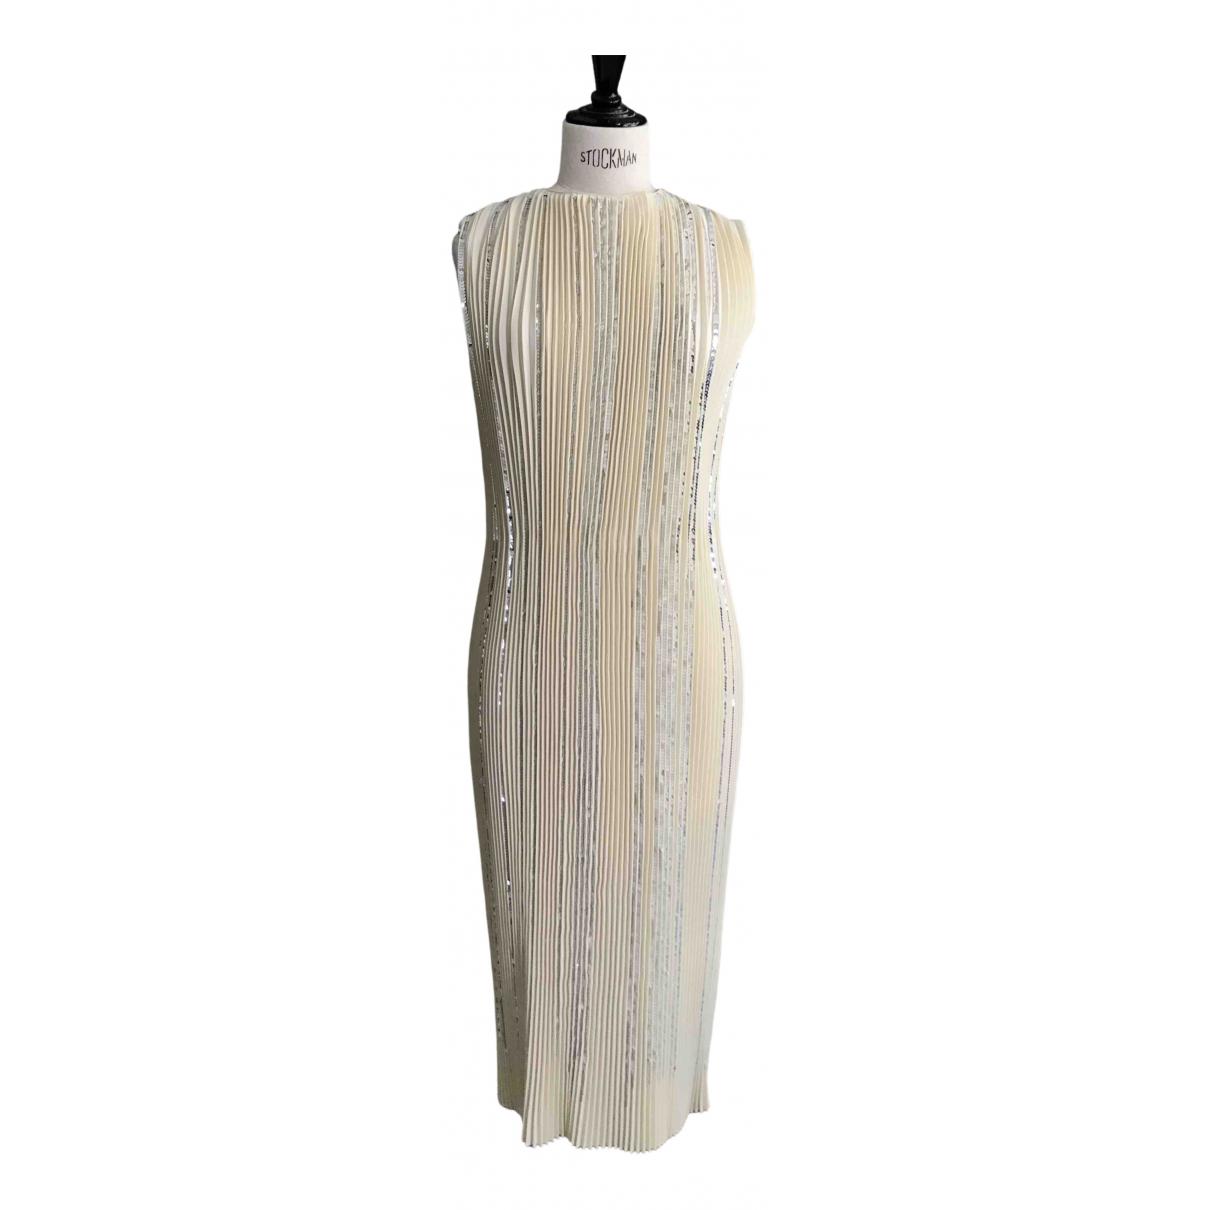 Nina Ricci \N Ecru dress for Women 34 FR